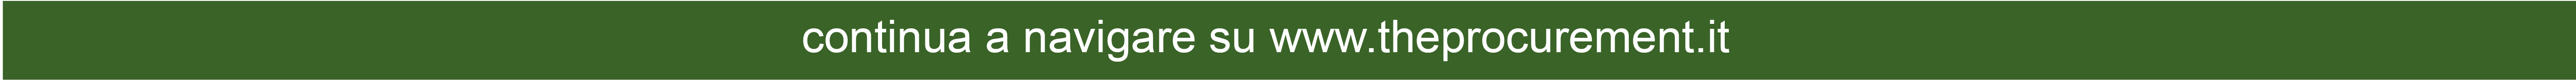 homepage-naviga-01-01